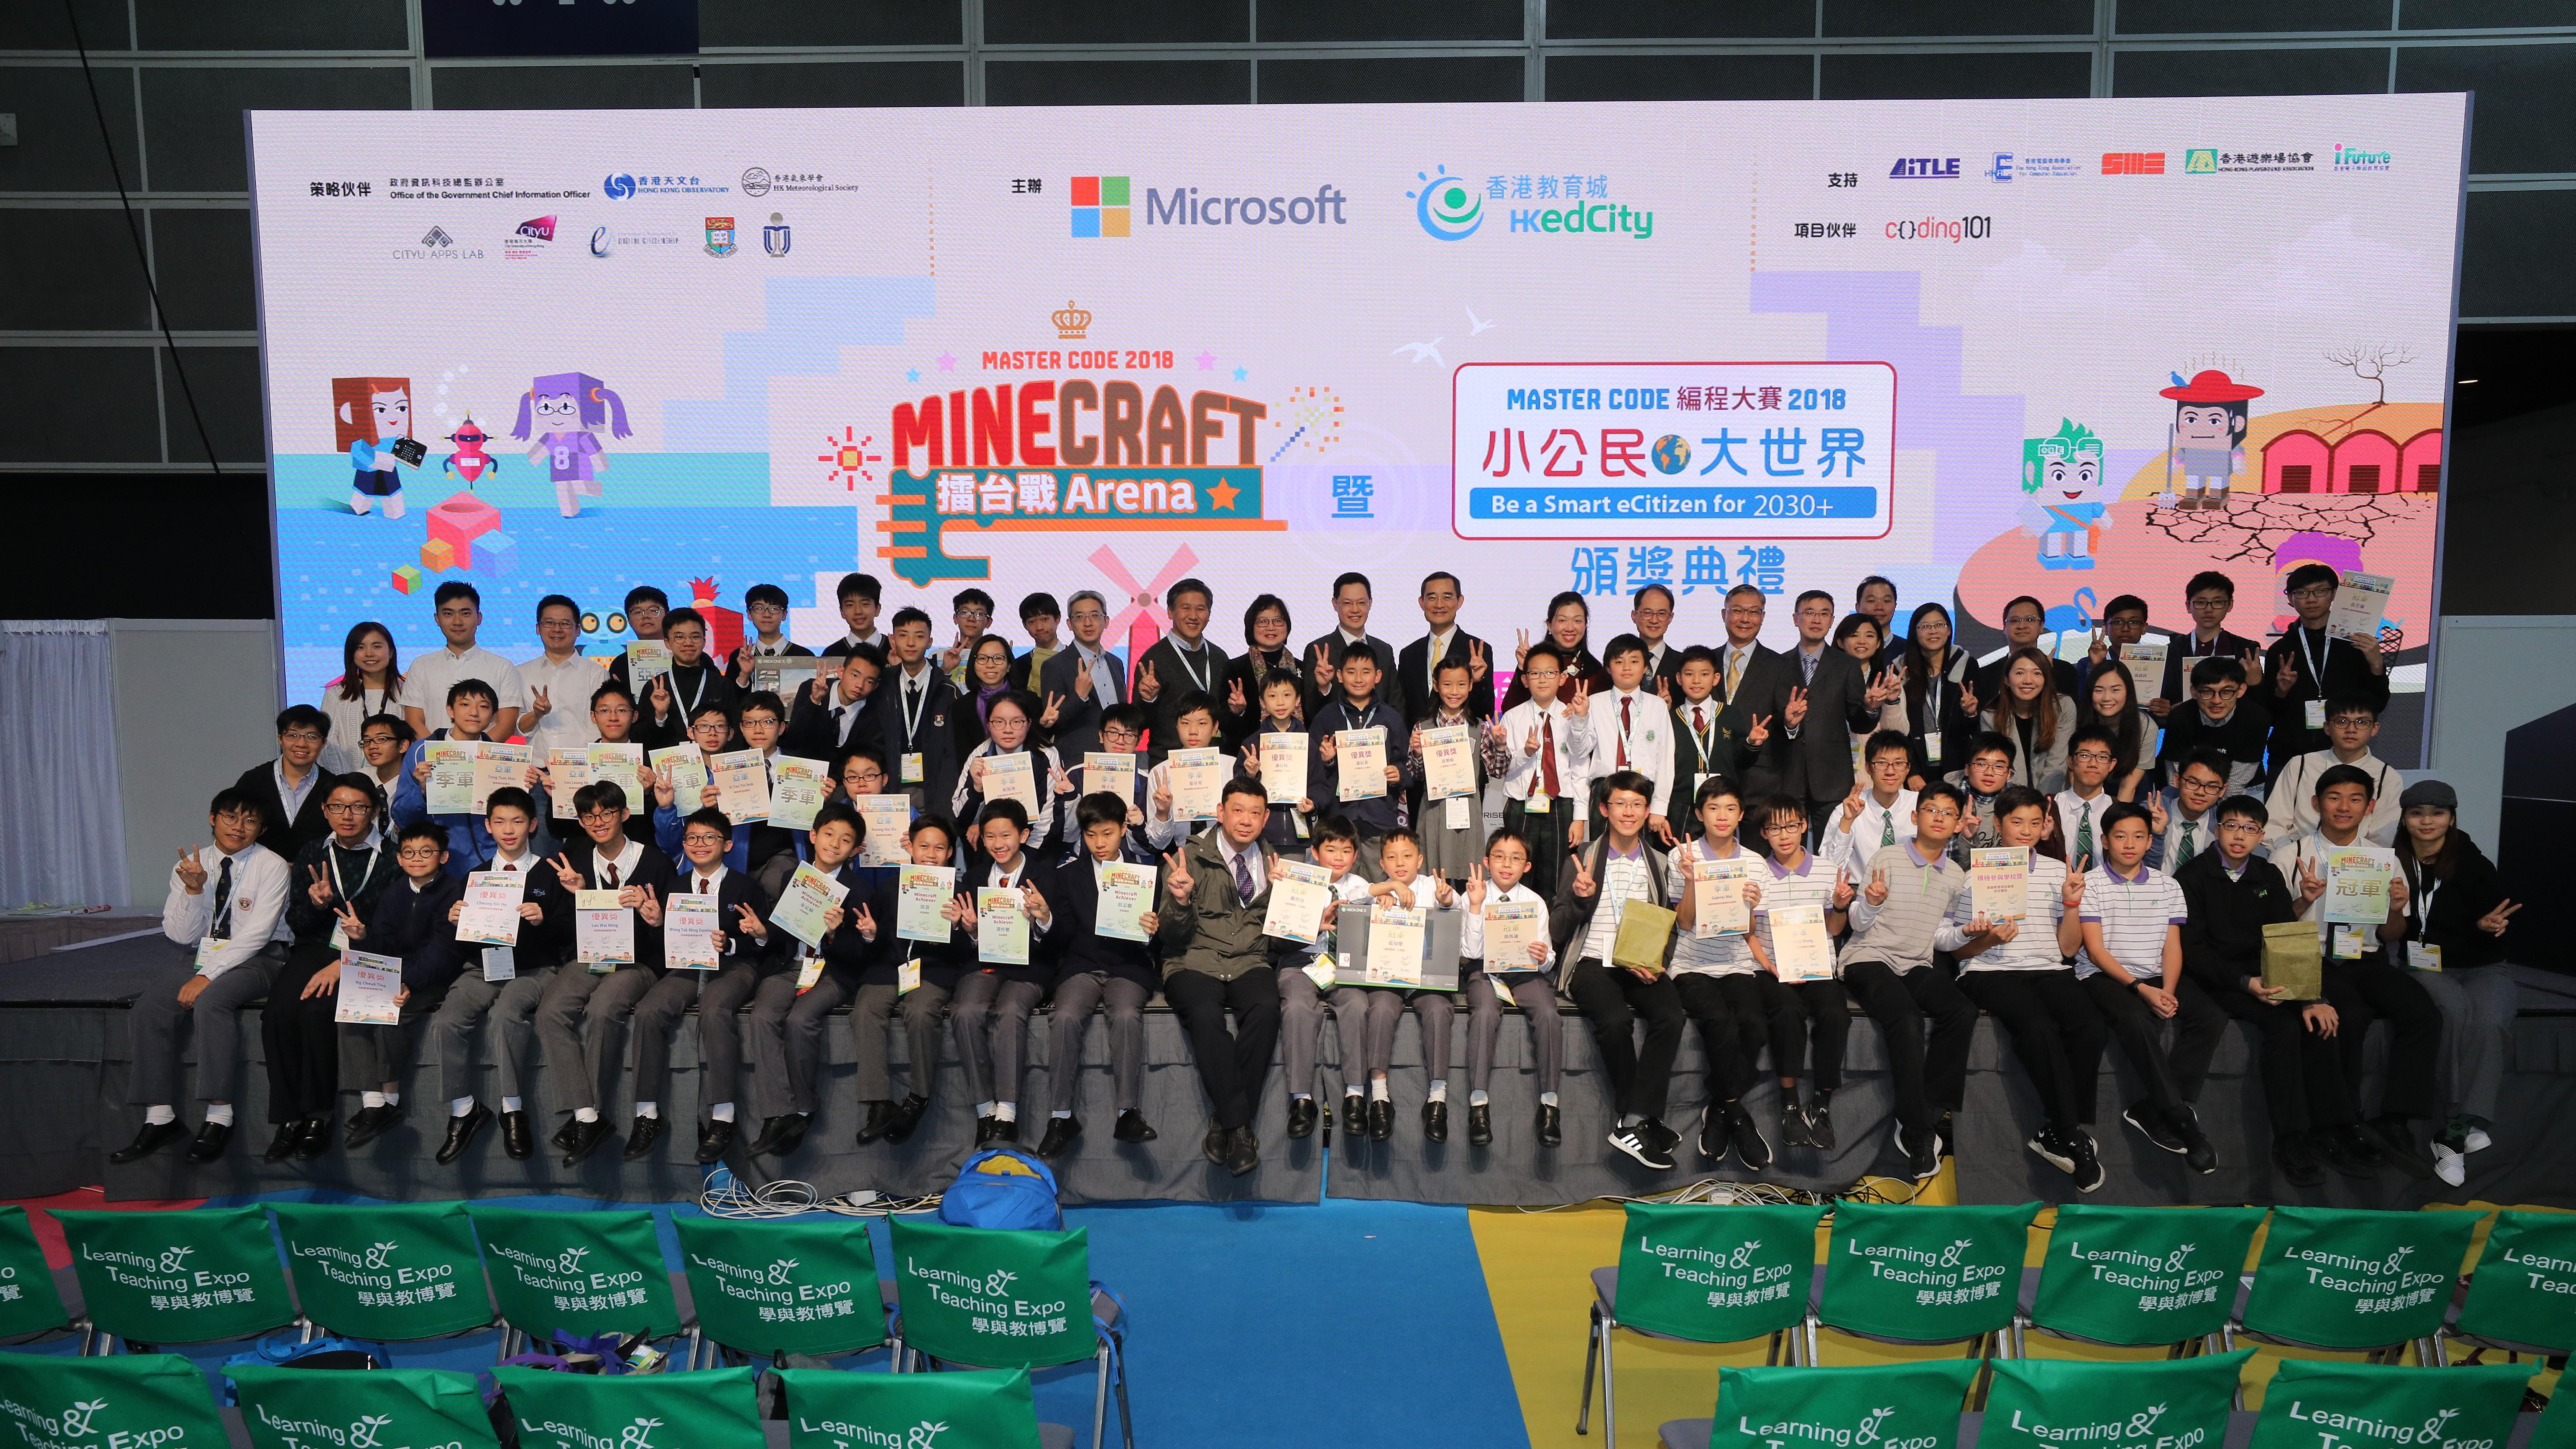 Minecraft 擂台戰暨「Master Code編程大賽2018:小公民.大世界」頒獎禮